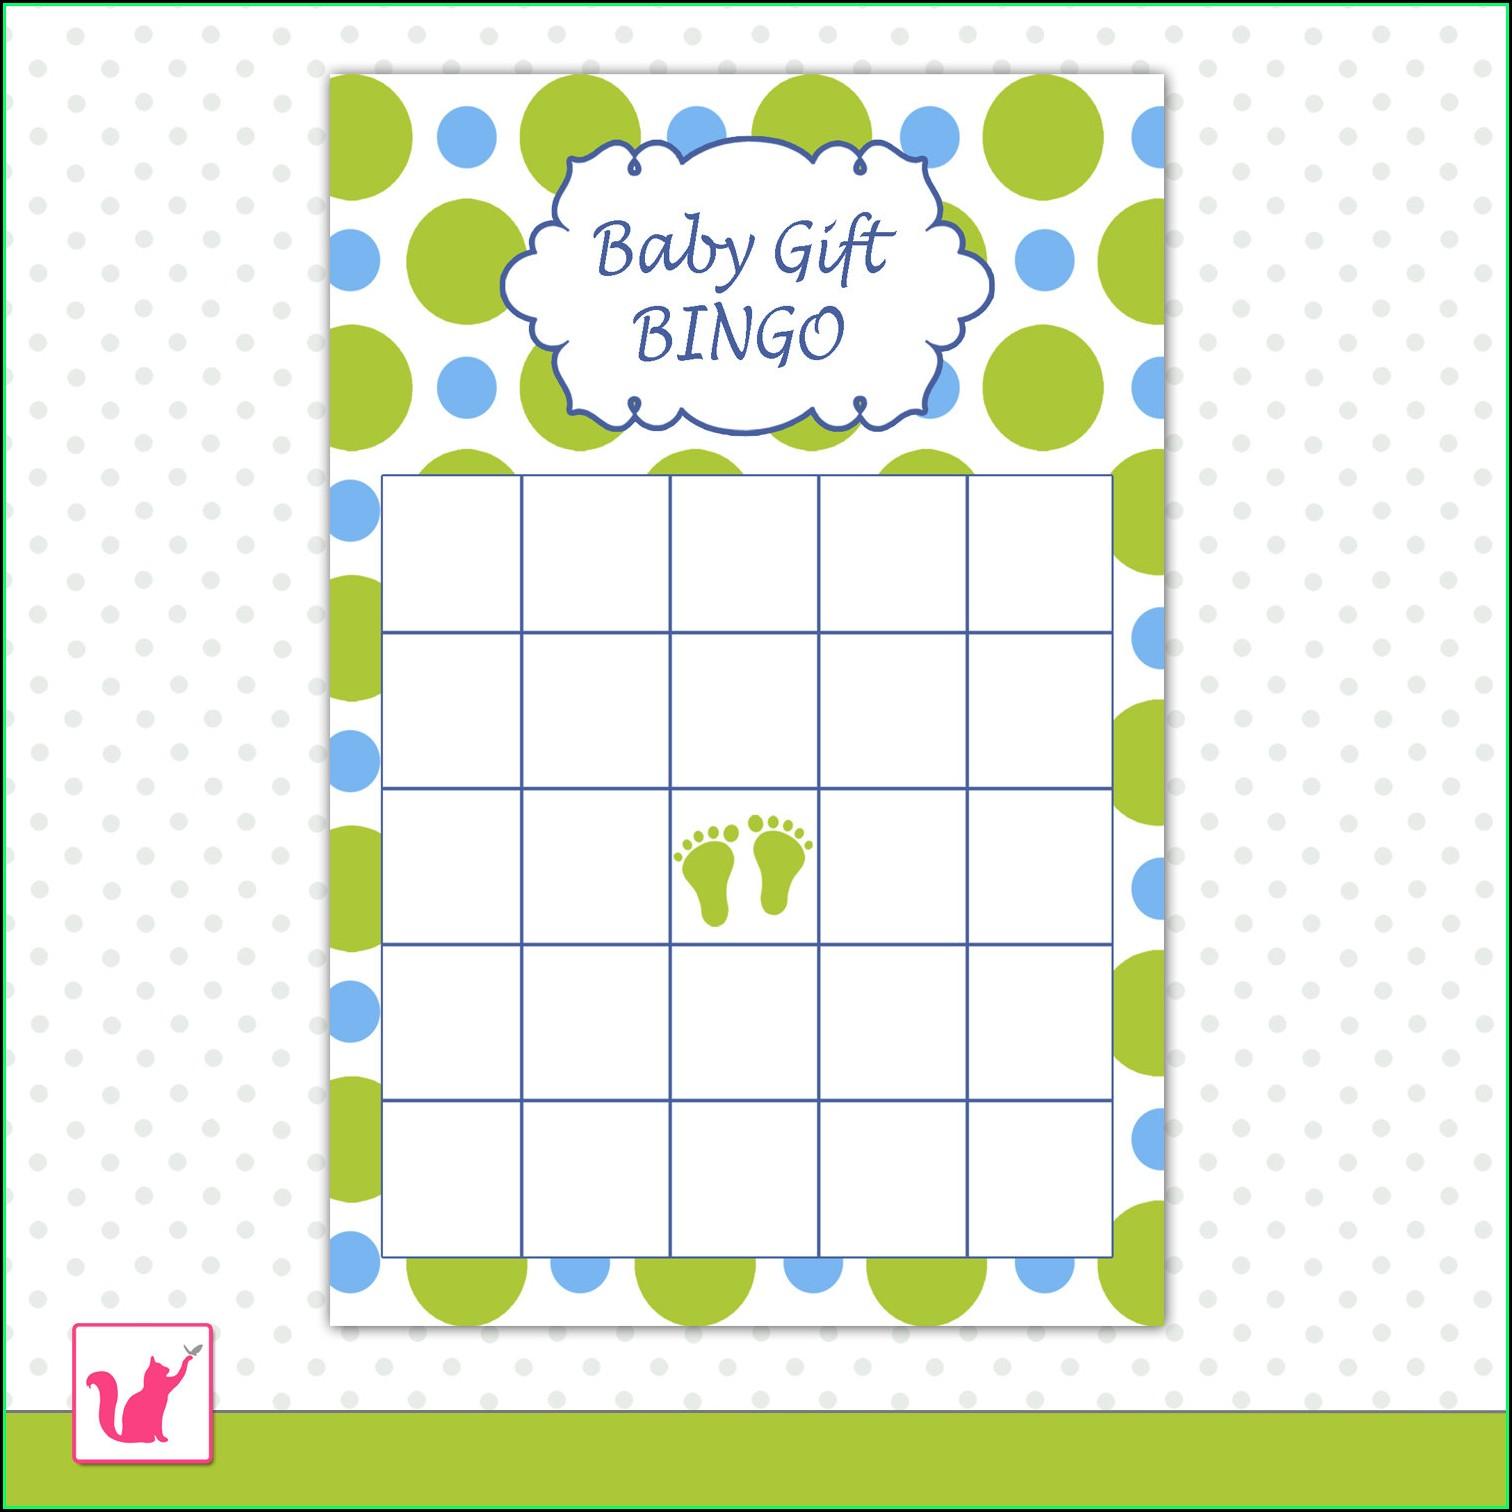 Baby Shower Bingo Template Word